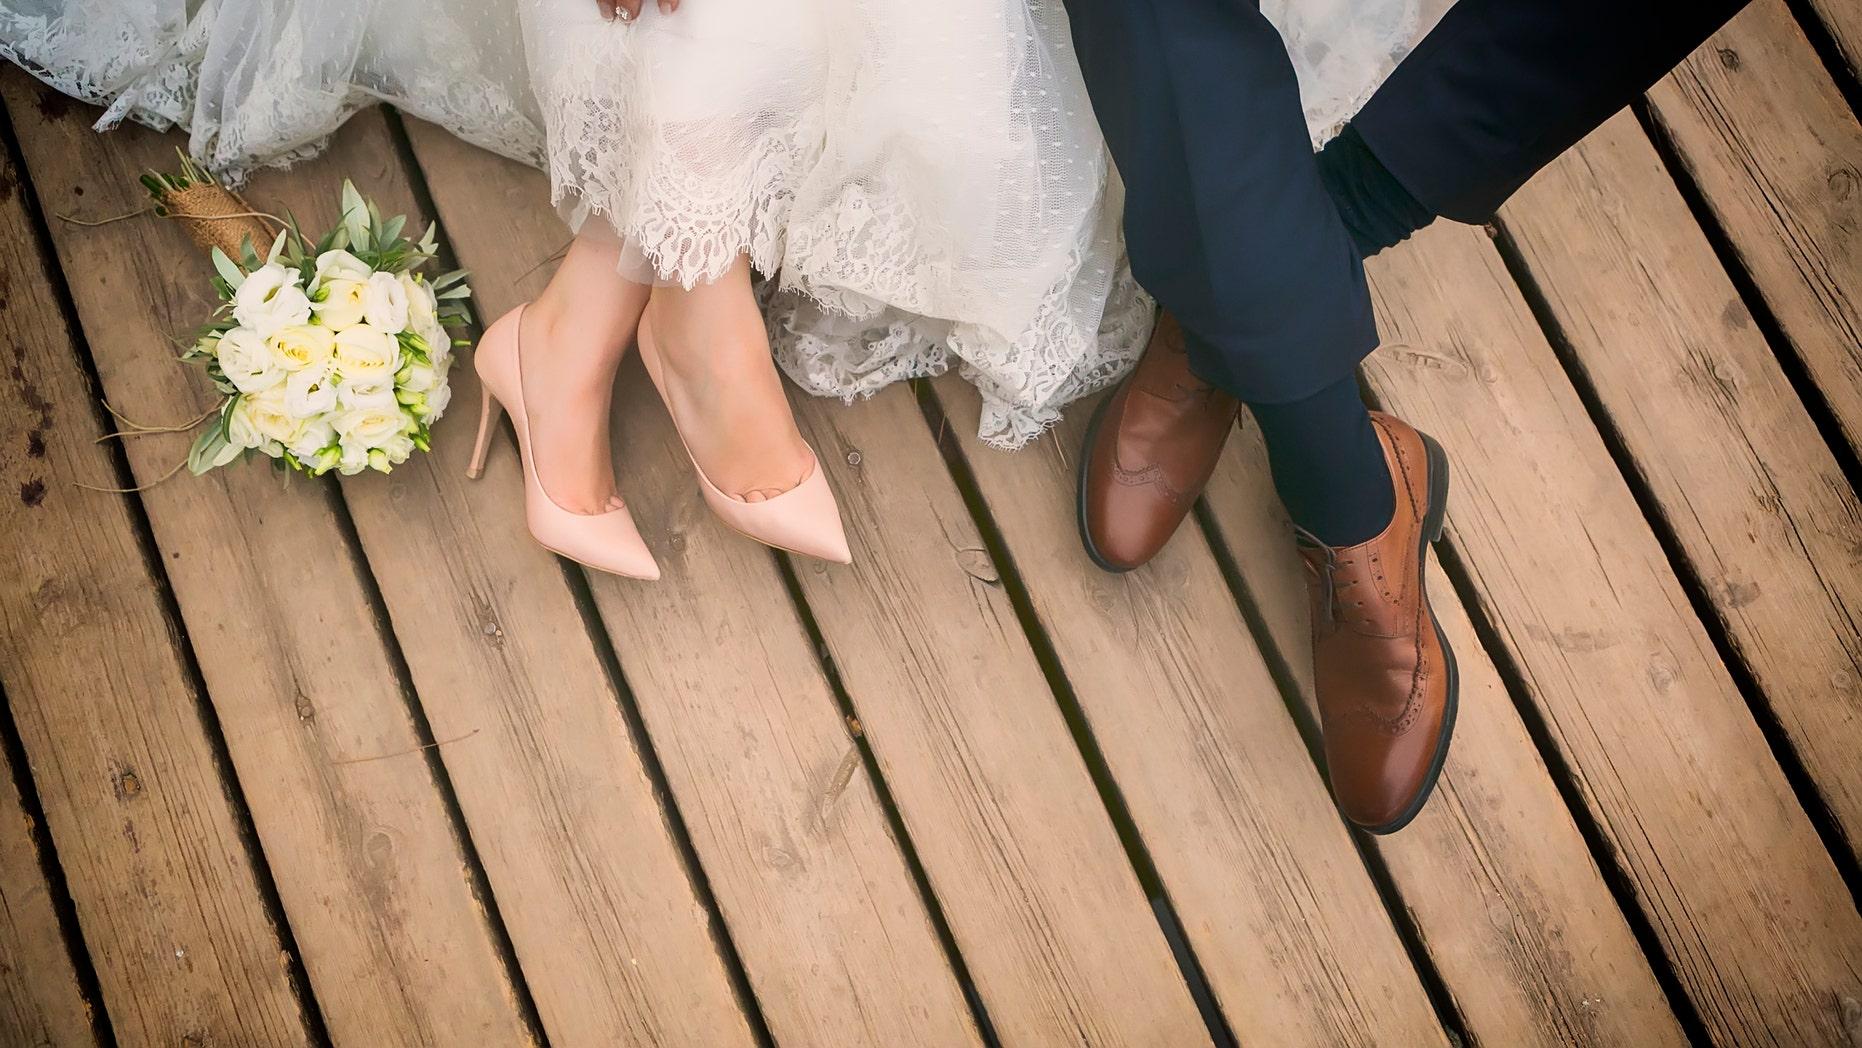 feet of bride and groom, wedding shoes (soft focus). Cross processed image for vintage lookfeet of bride and groom, wedding shoes (soft focus). Cross processed image for vintage look